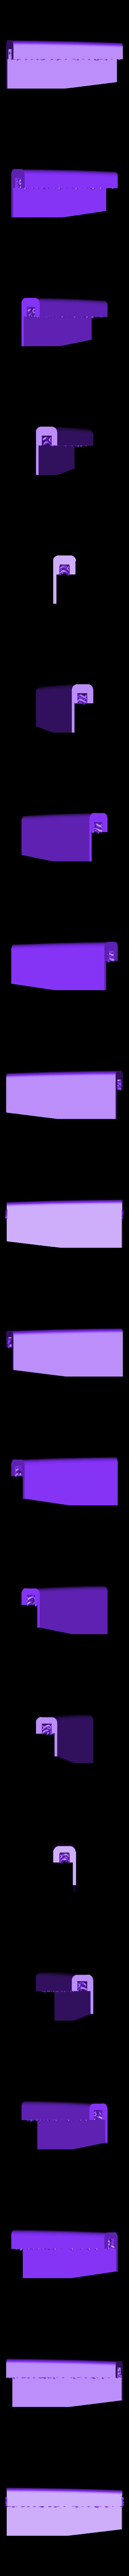 Pylon-Rr-Fair01ws.stl Download STL file Thrust Reverser with Turbofan Engine Nacelle • 3D printable model, konchan77